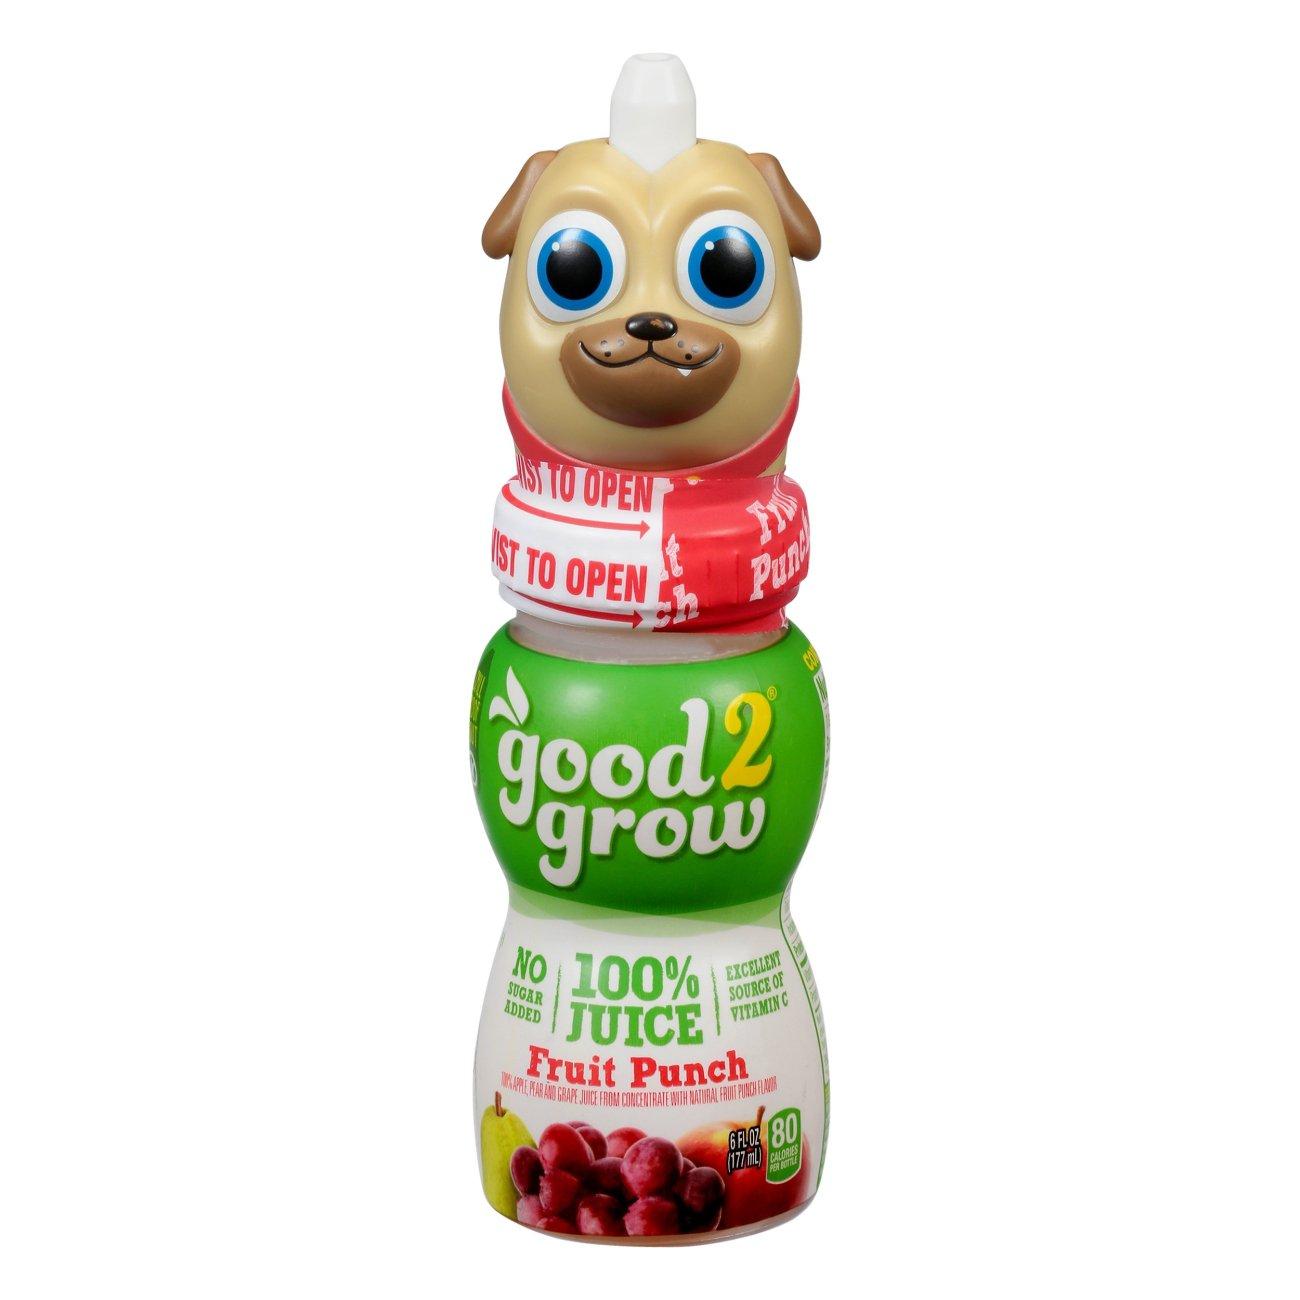 Fruit splash classic - Good 2 Grow Fruit Punch 100 Juice Assorted Characters